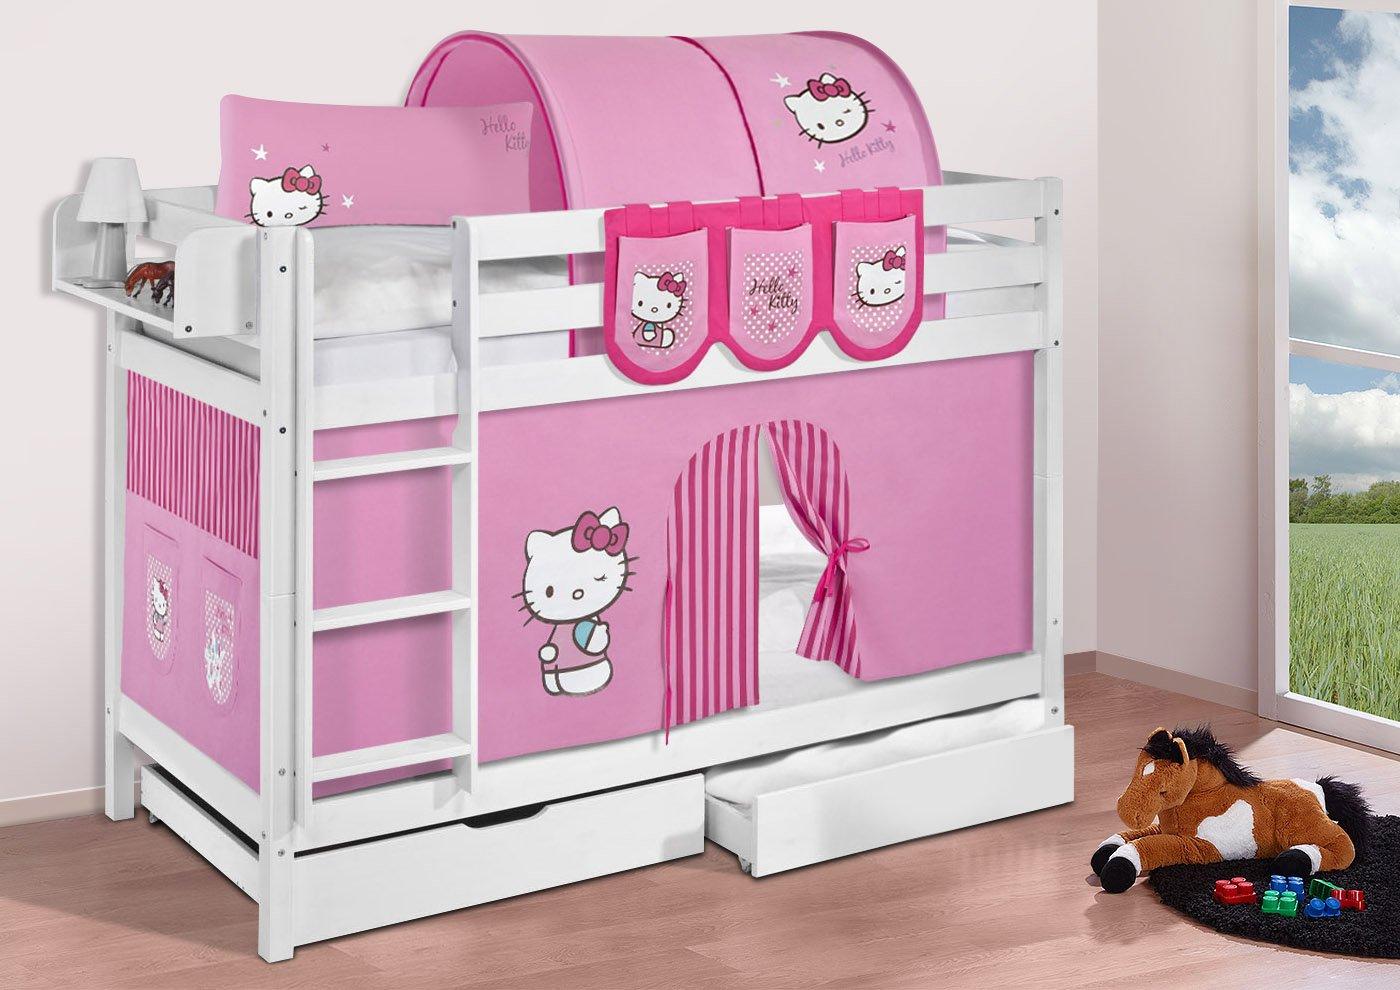 Etagenbett Jelle : Lilokids buche massivholz etagenbett jelle hello kitty rosa